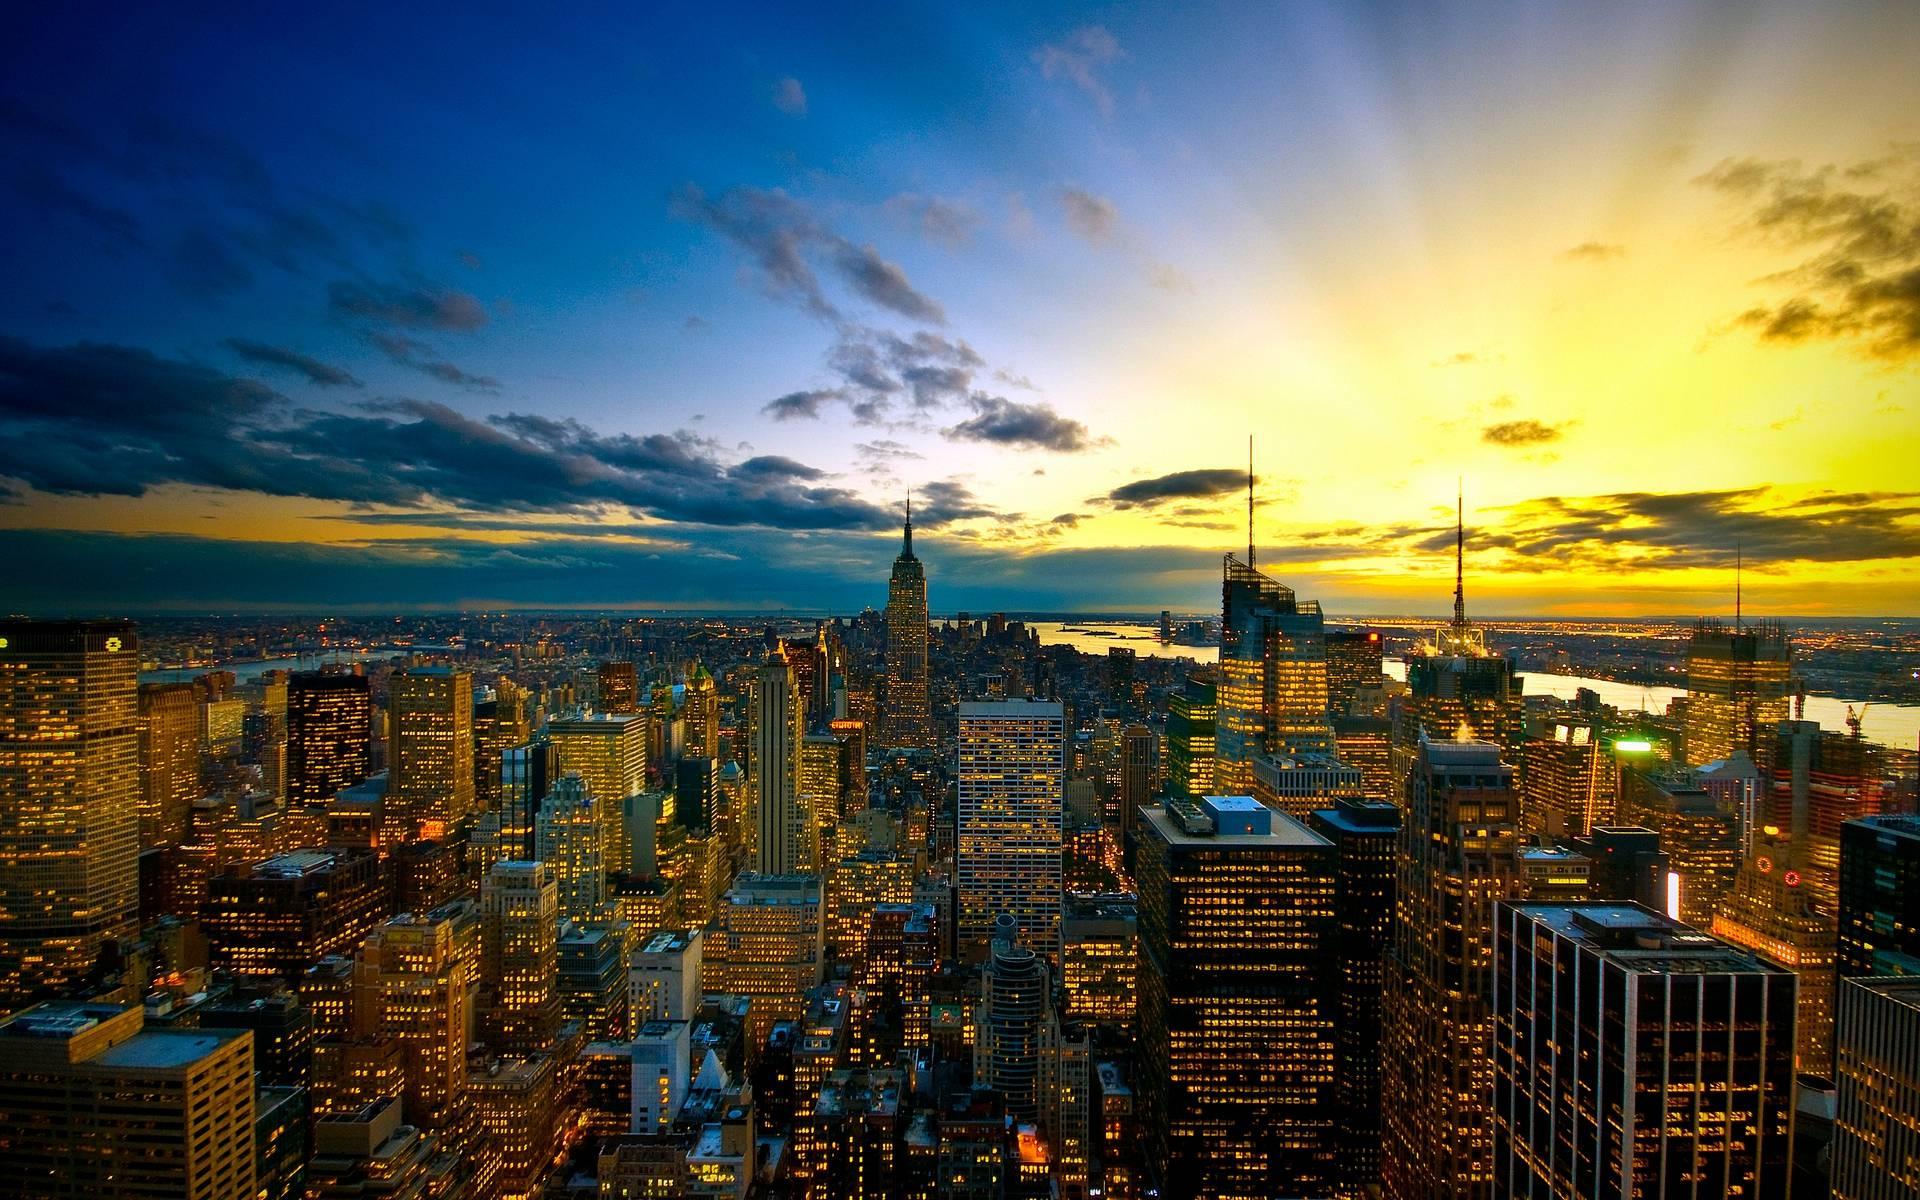 Hd wallpaper travel - New York City Colors Hd Wallpaper Travel World Wallpapers